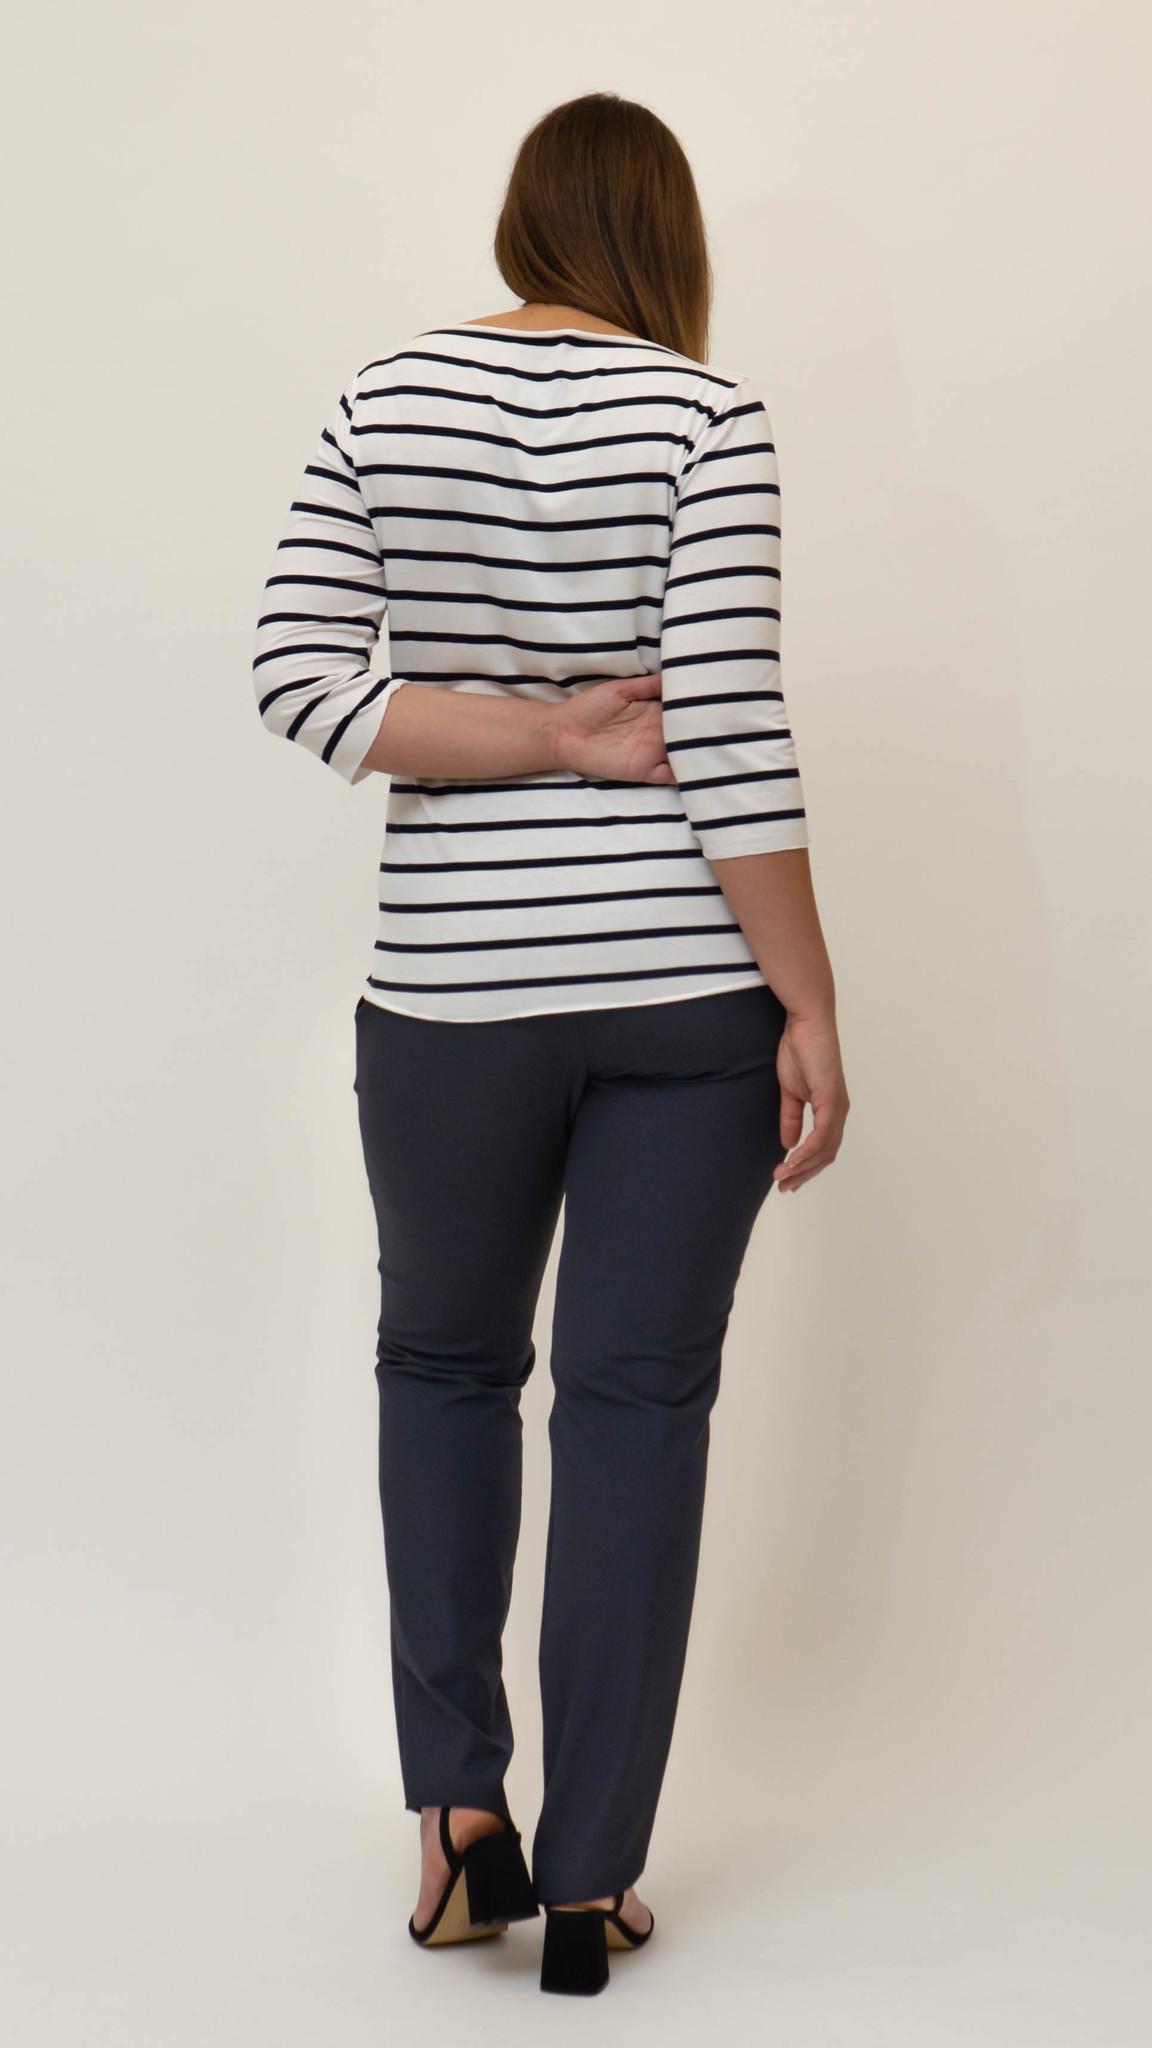 MARIETTE Shirt in Jersey-3